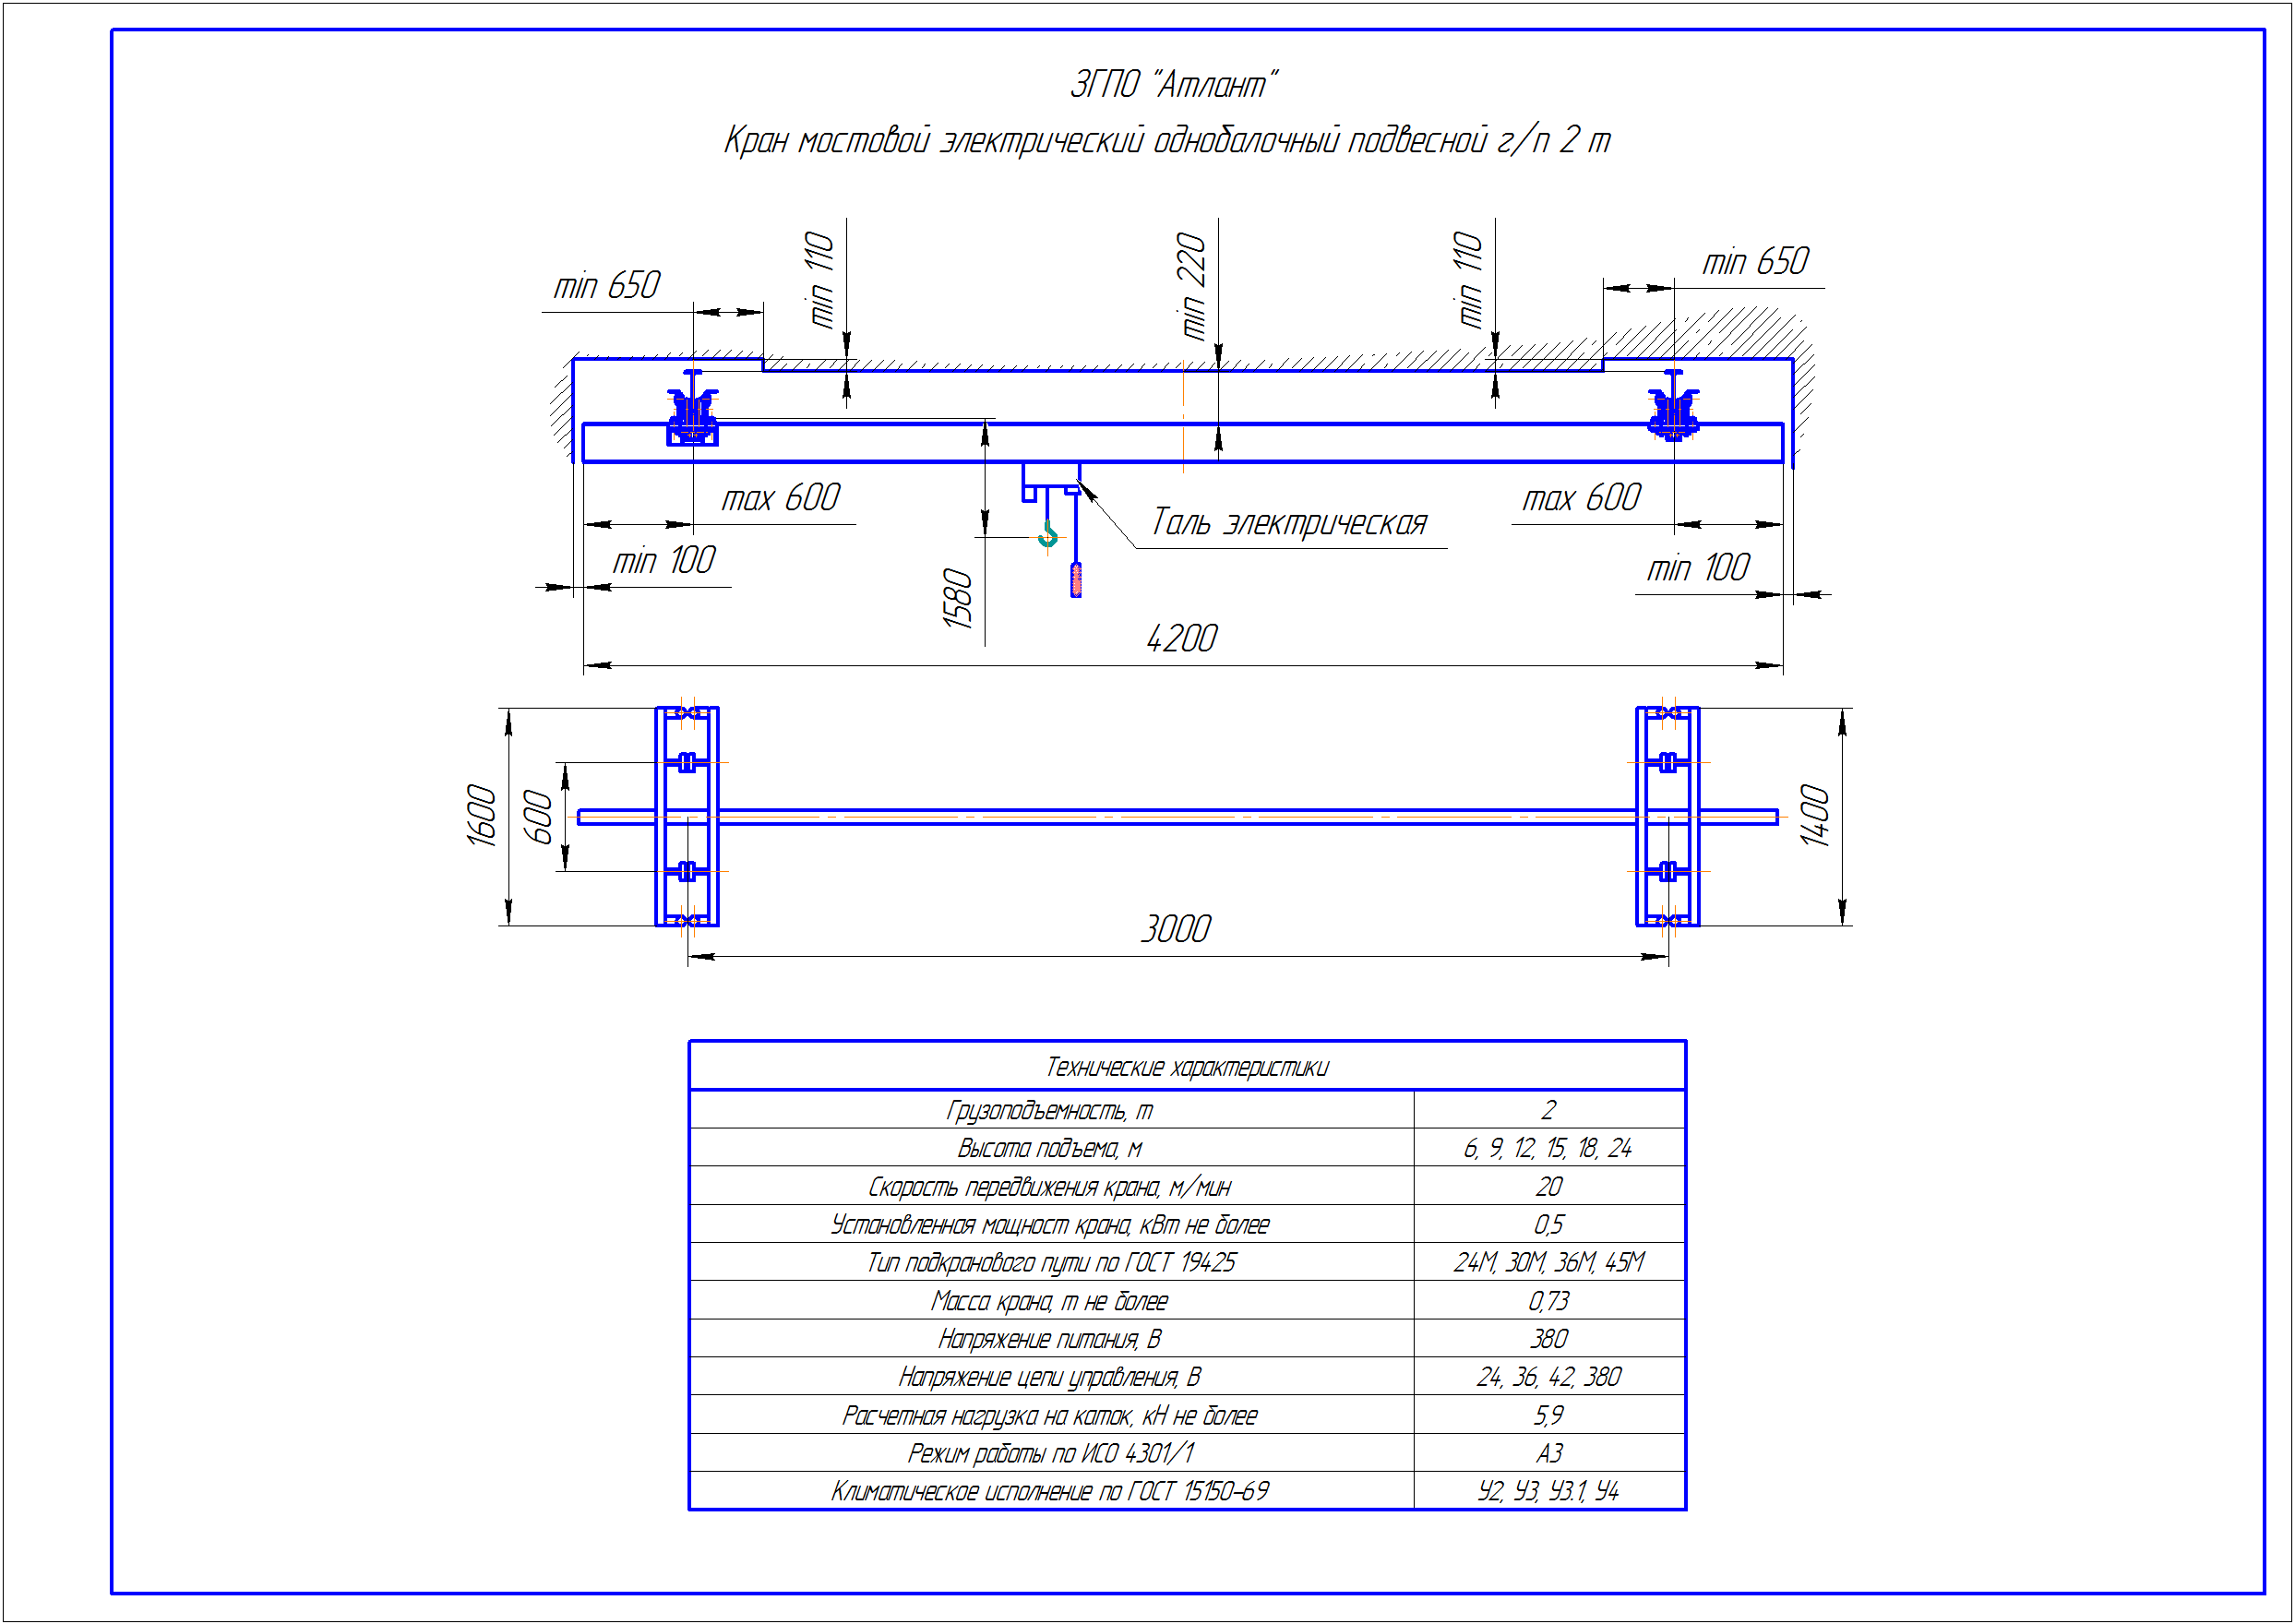 KBP 2 1 - Подвесная кран балка